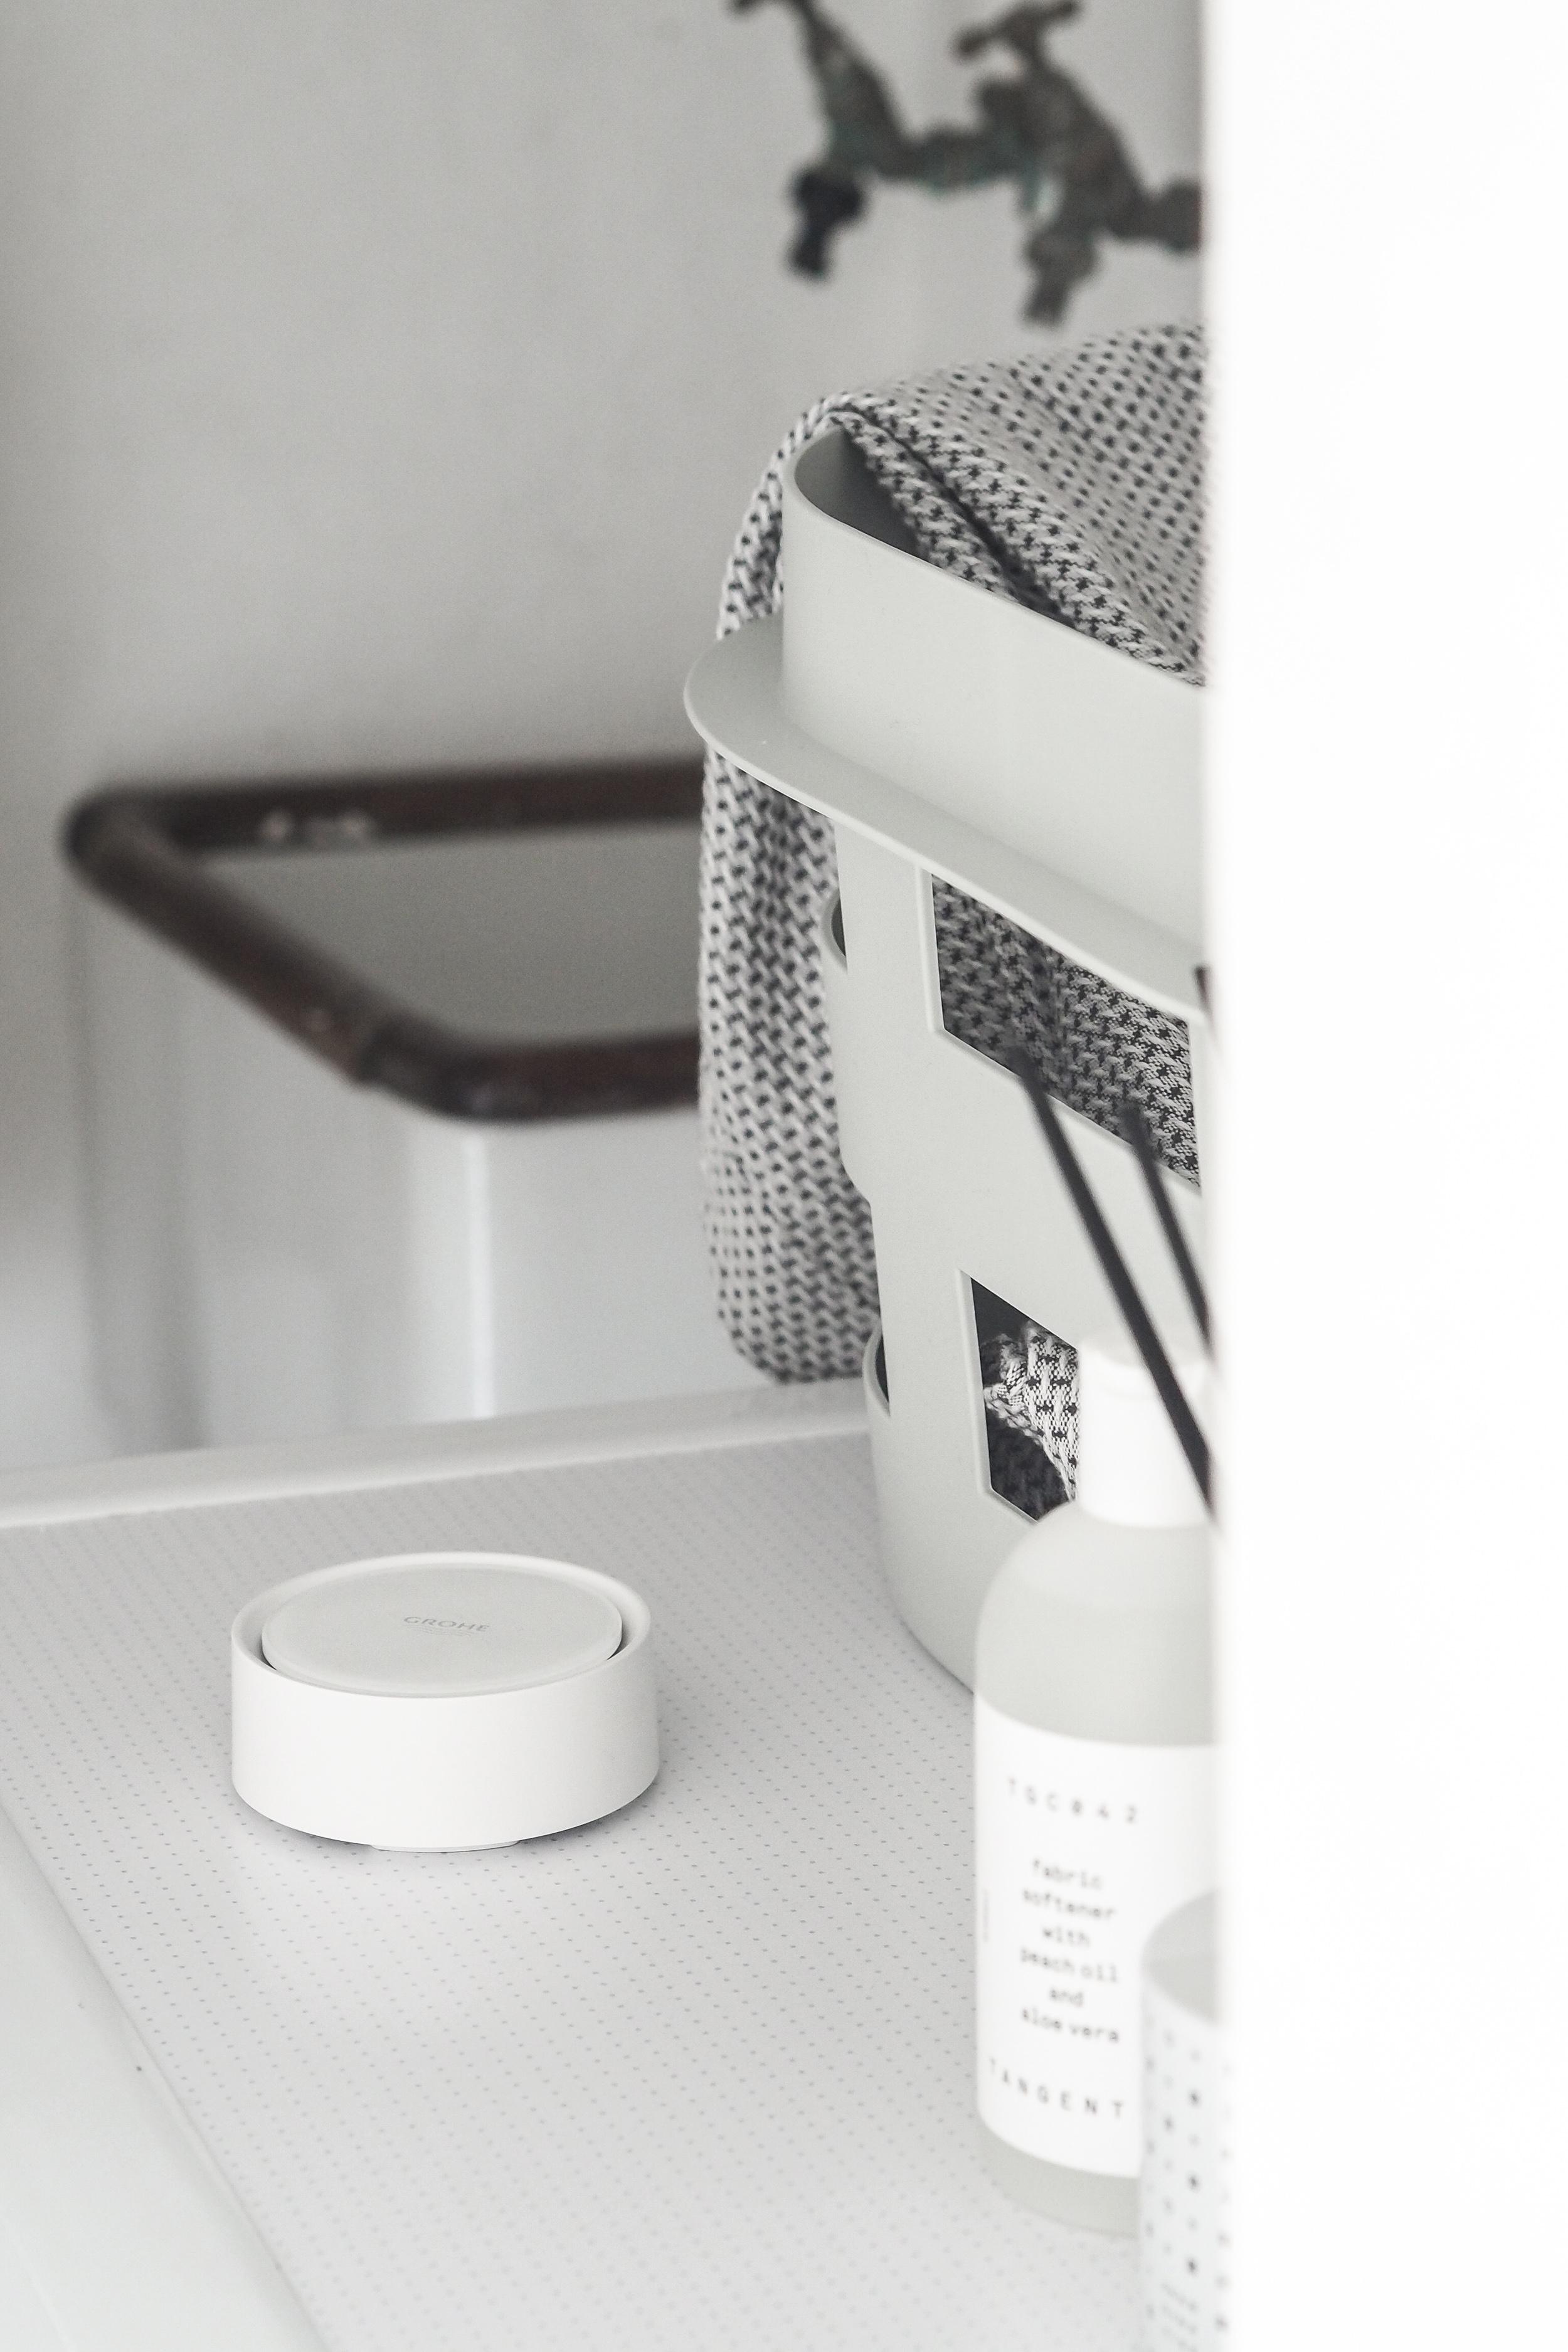 In my house, Grohe Sense water sensor